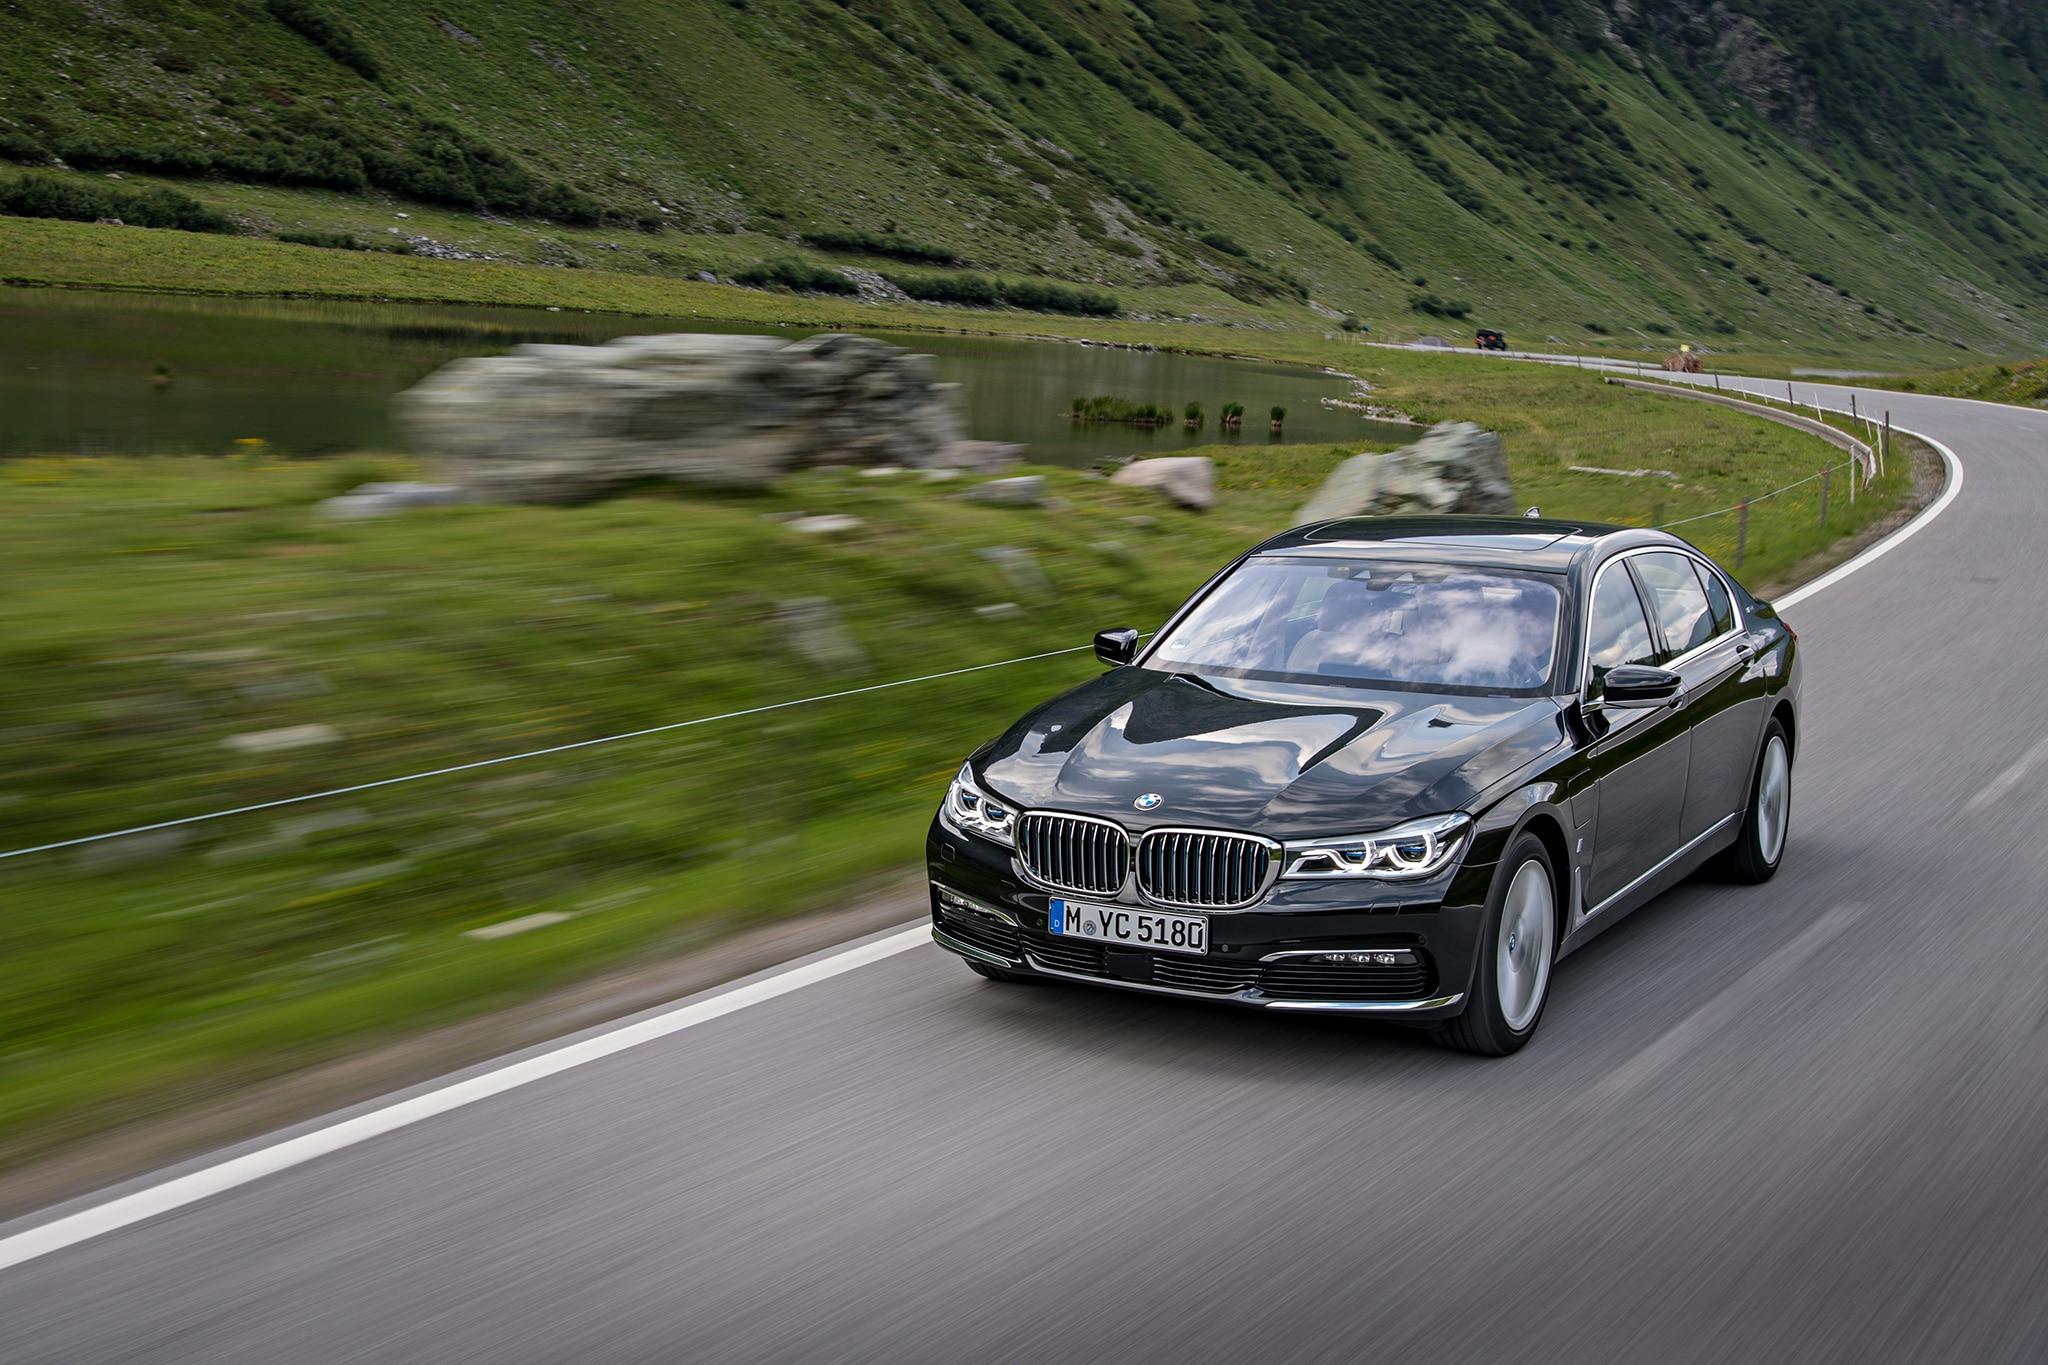 2017 BMW 740e XDrive IPerformance Heads To Dealerships 20 Advertisement Skip 1